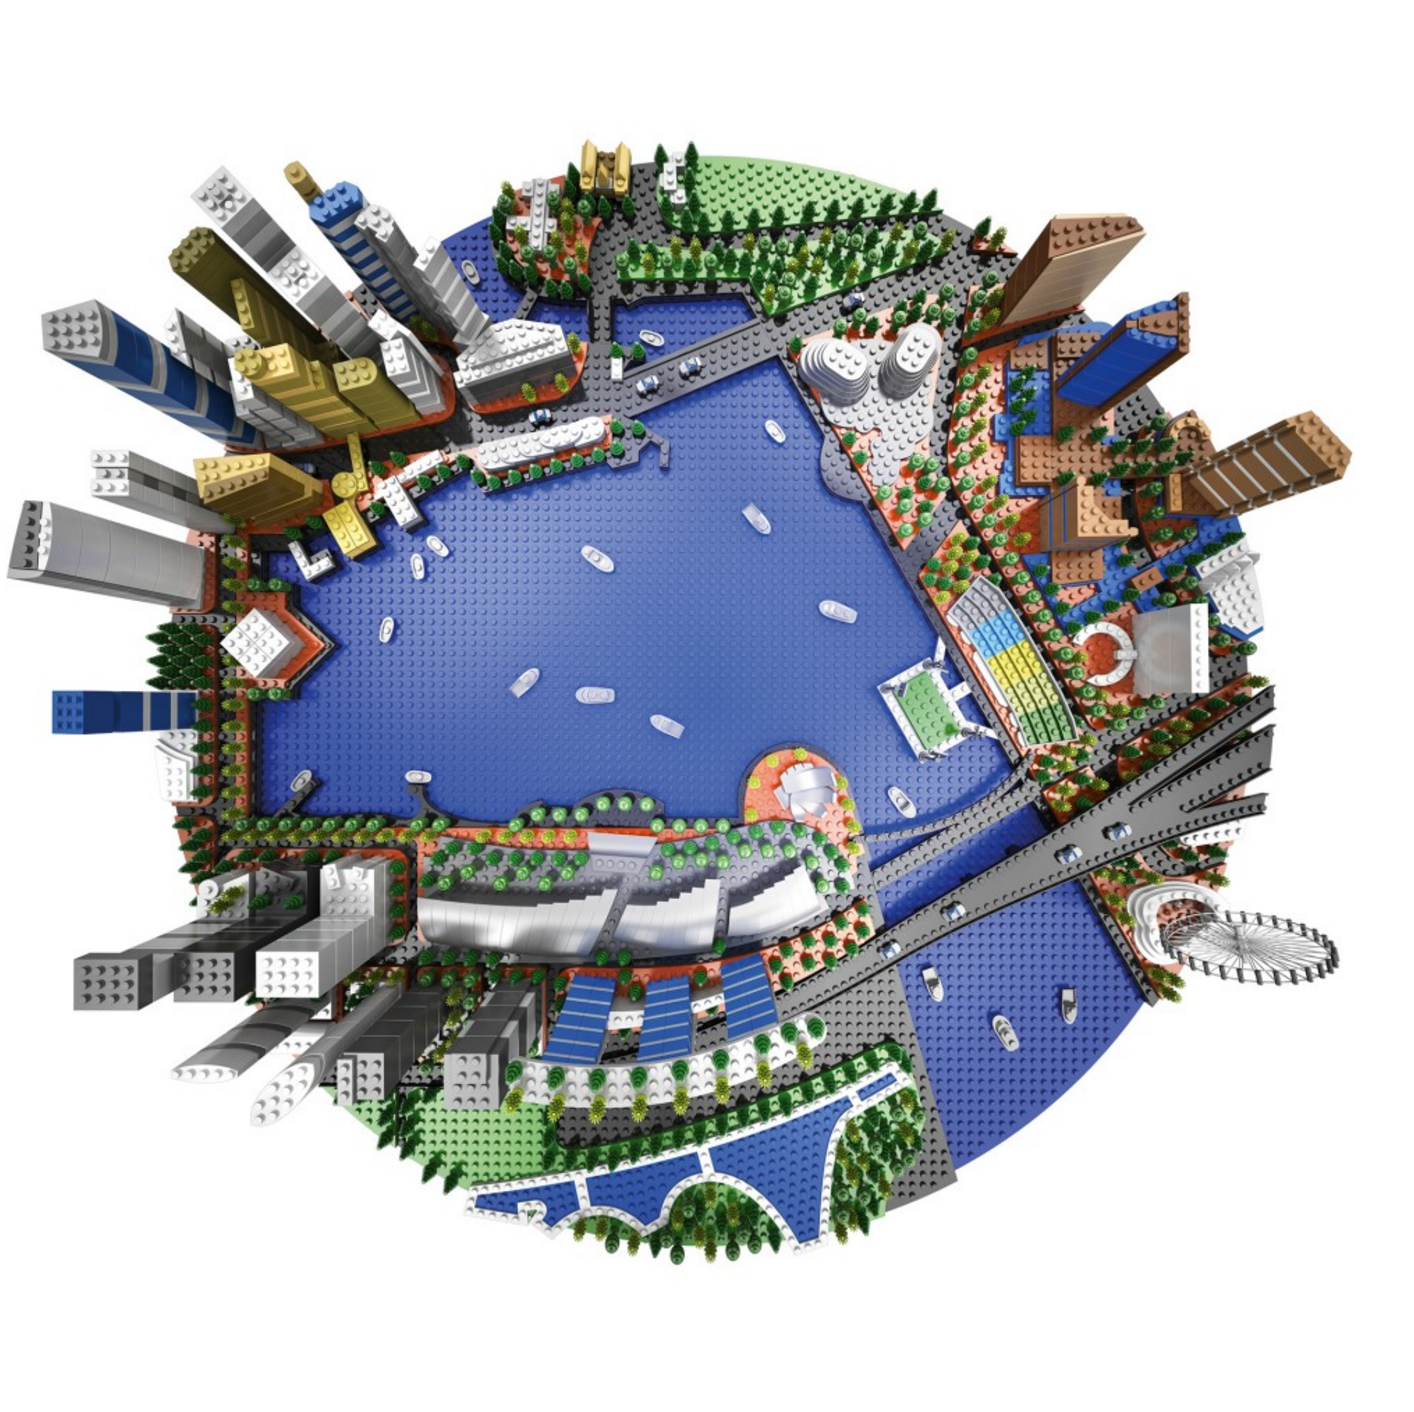 Singapore Economic Development Board – Lego